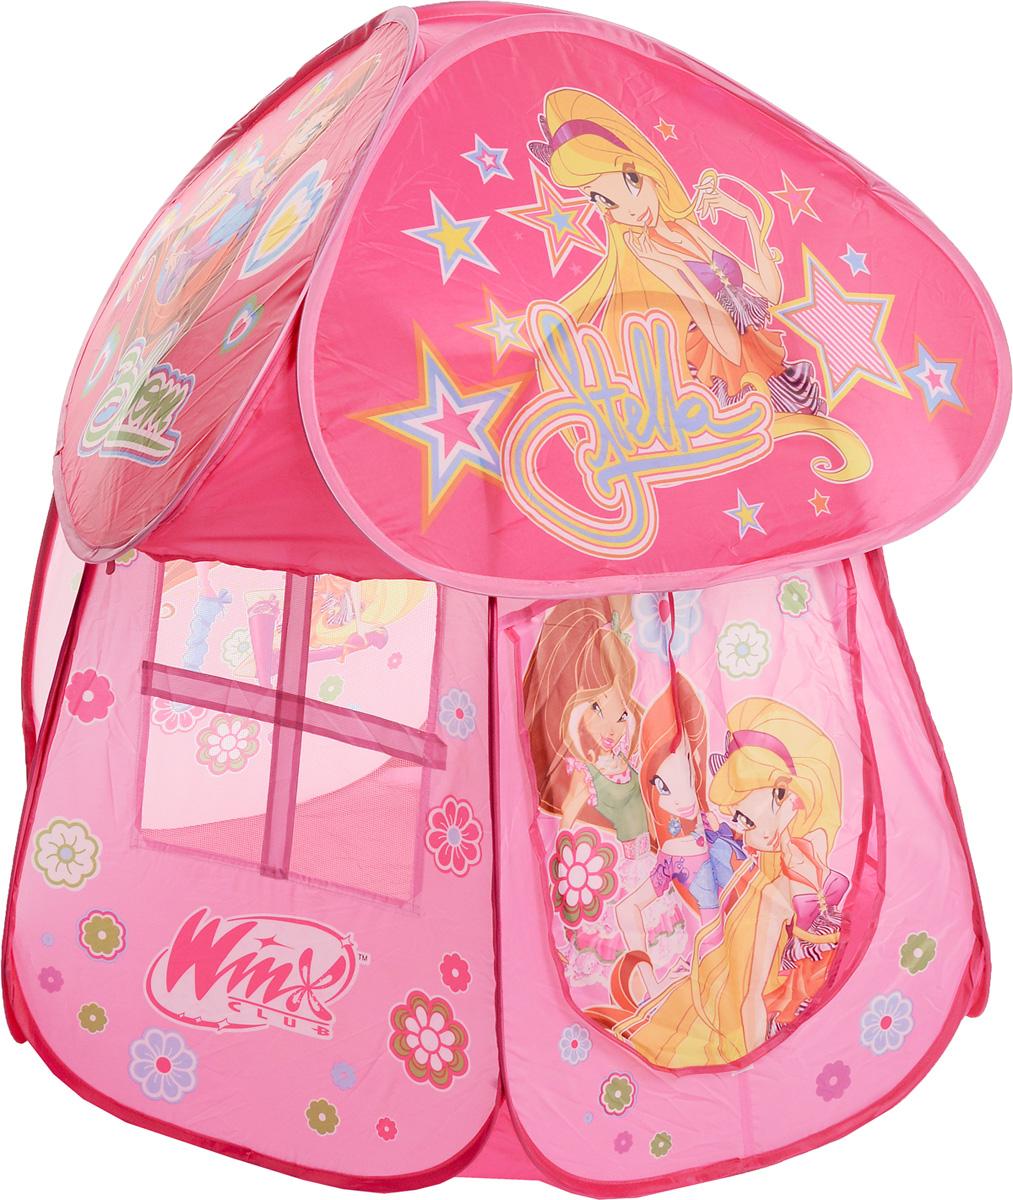 1TOY Детская игровая палатка Winx Club 100 х 90 х 95 см Т56299